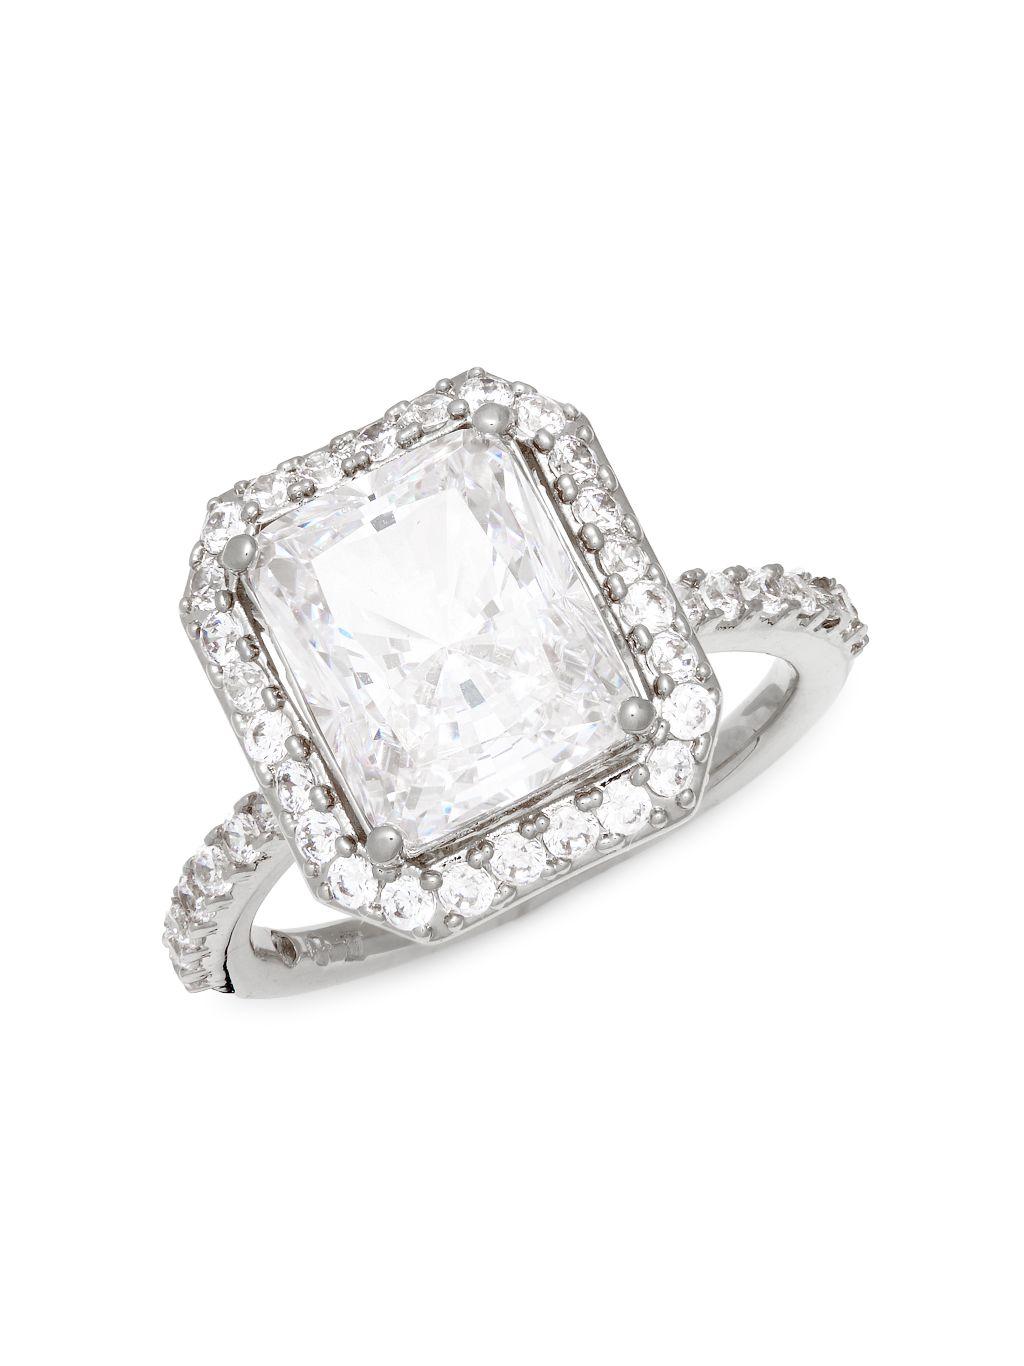 Adriana Orsini Crystal Ring